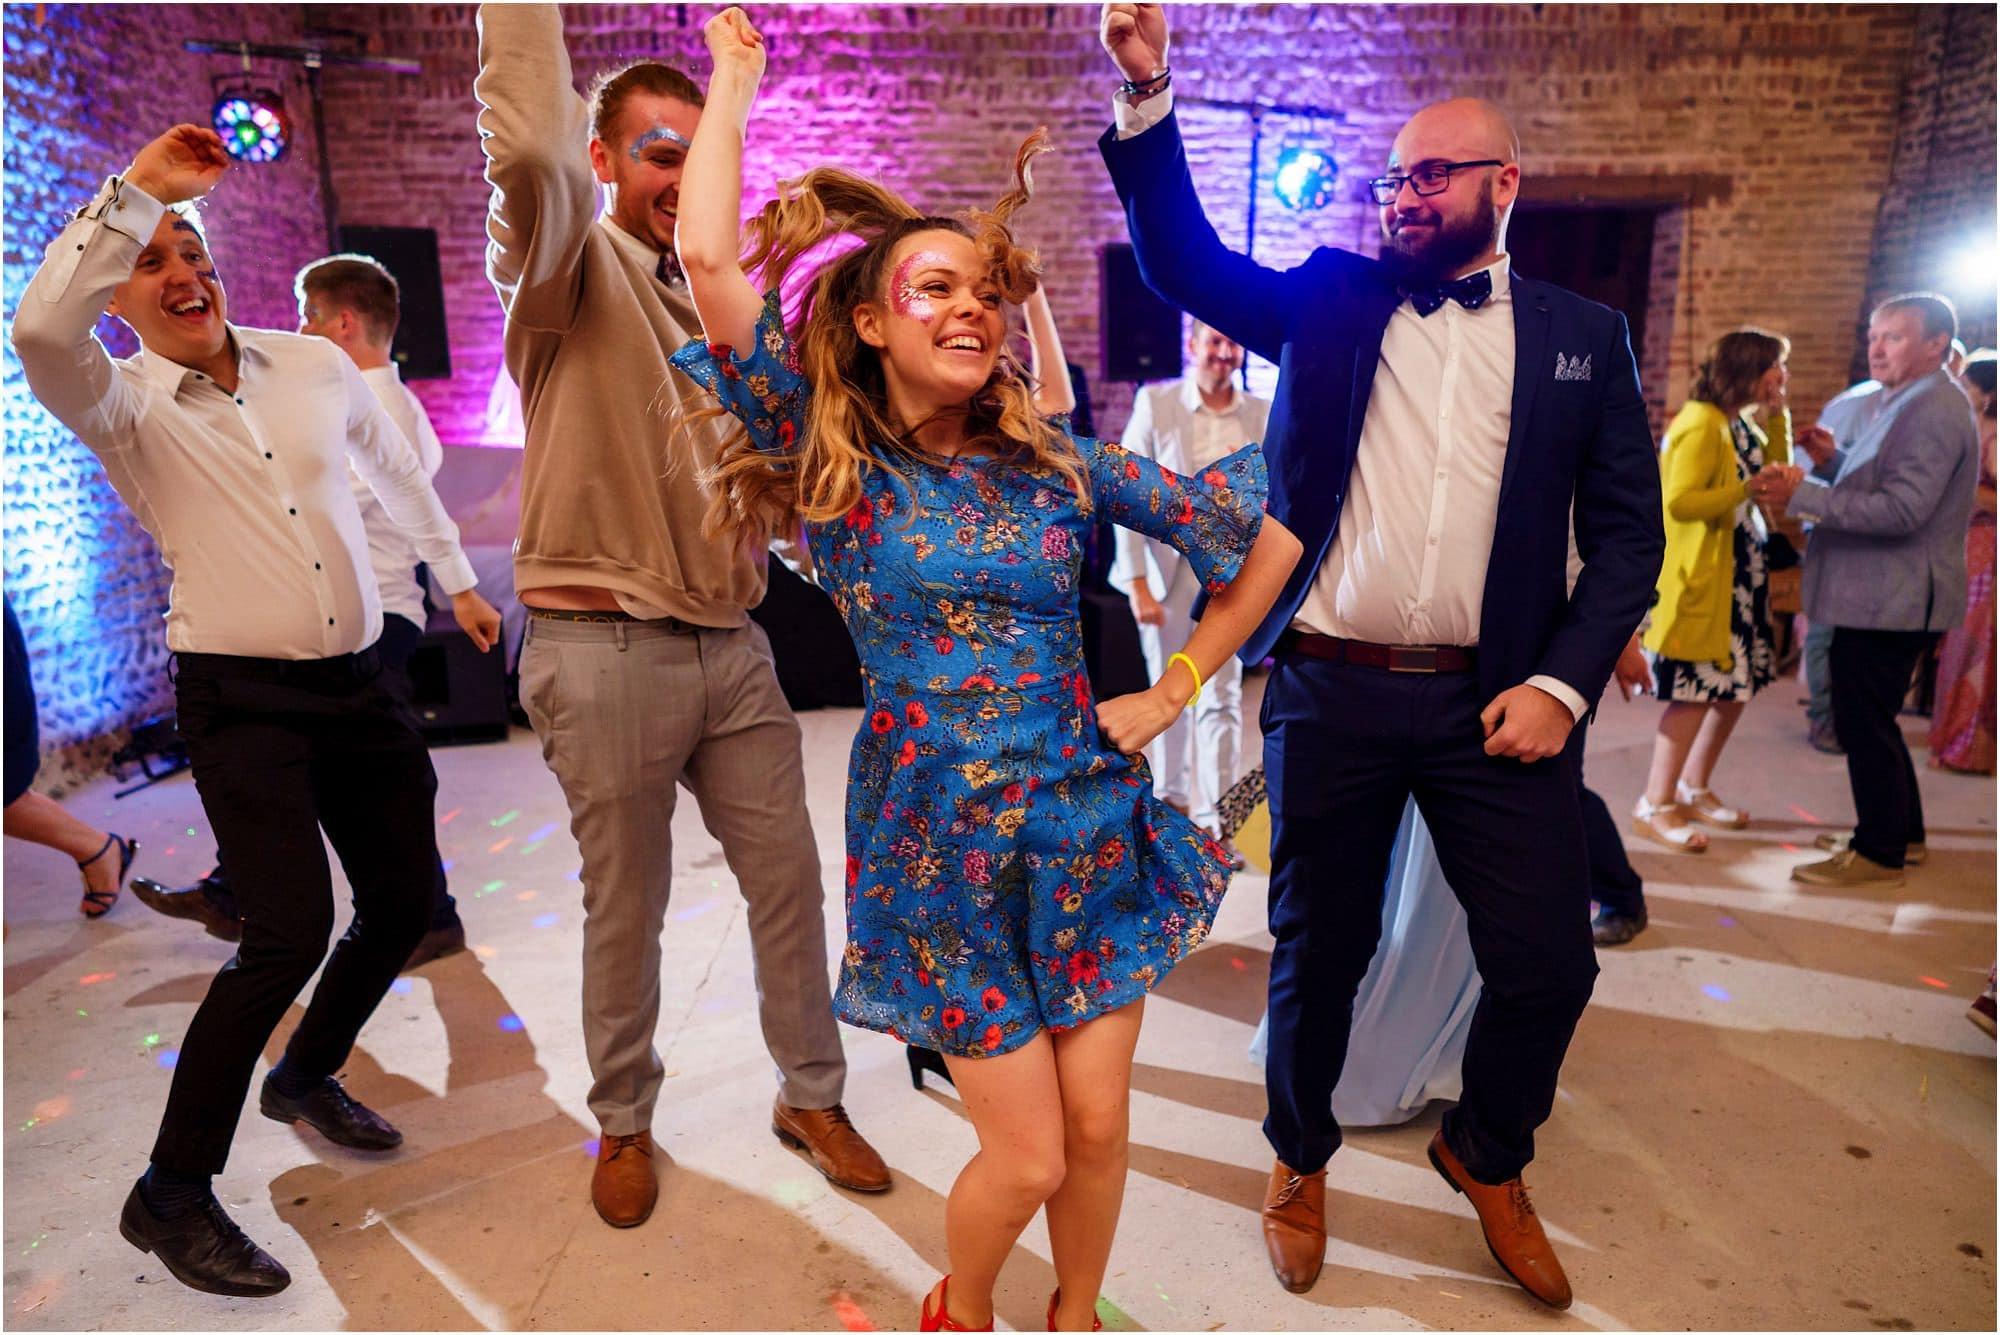 Waxham Barn Wedding reception fun